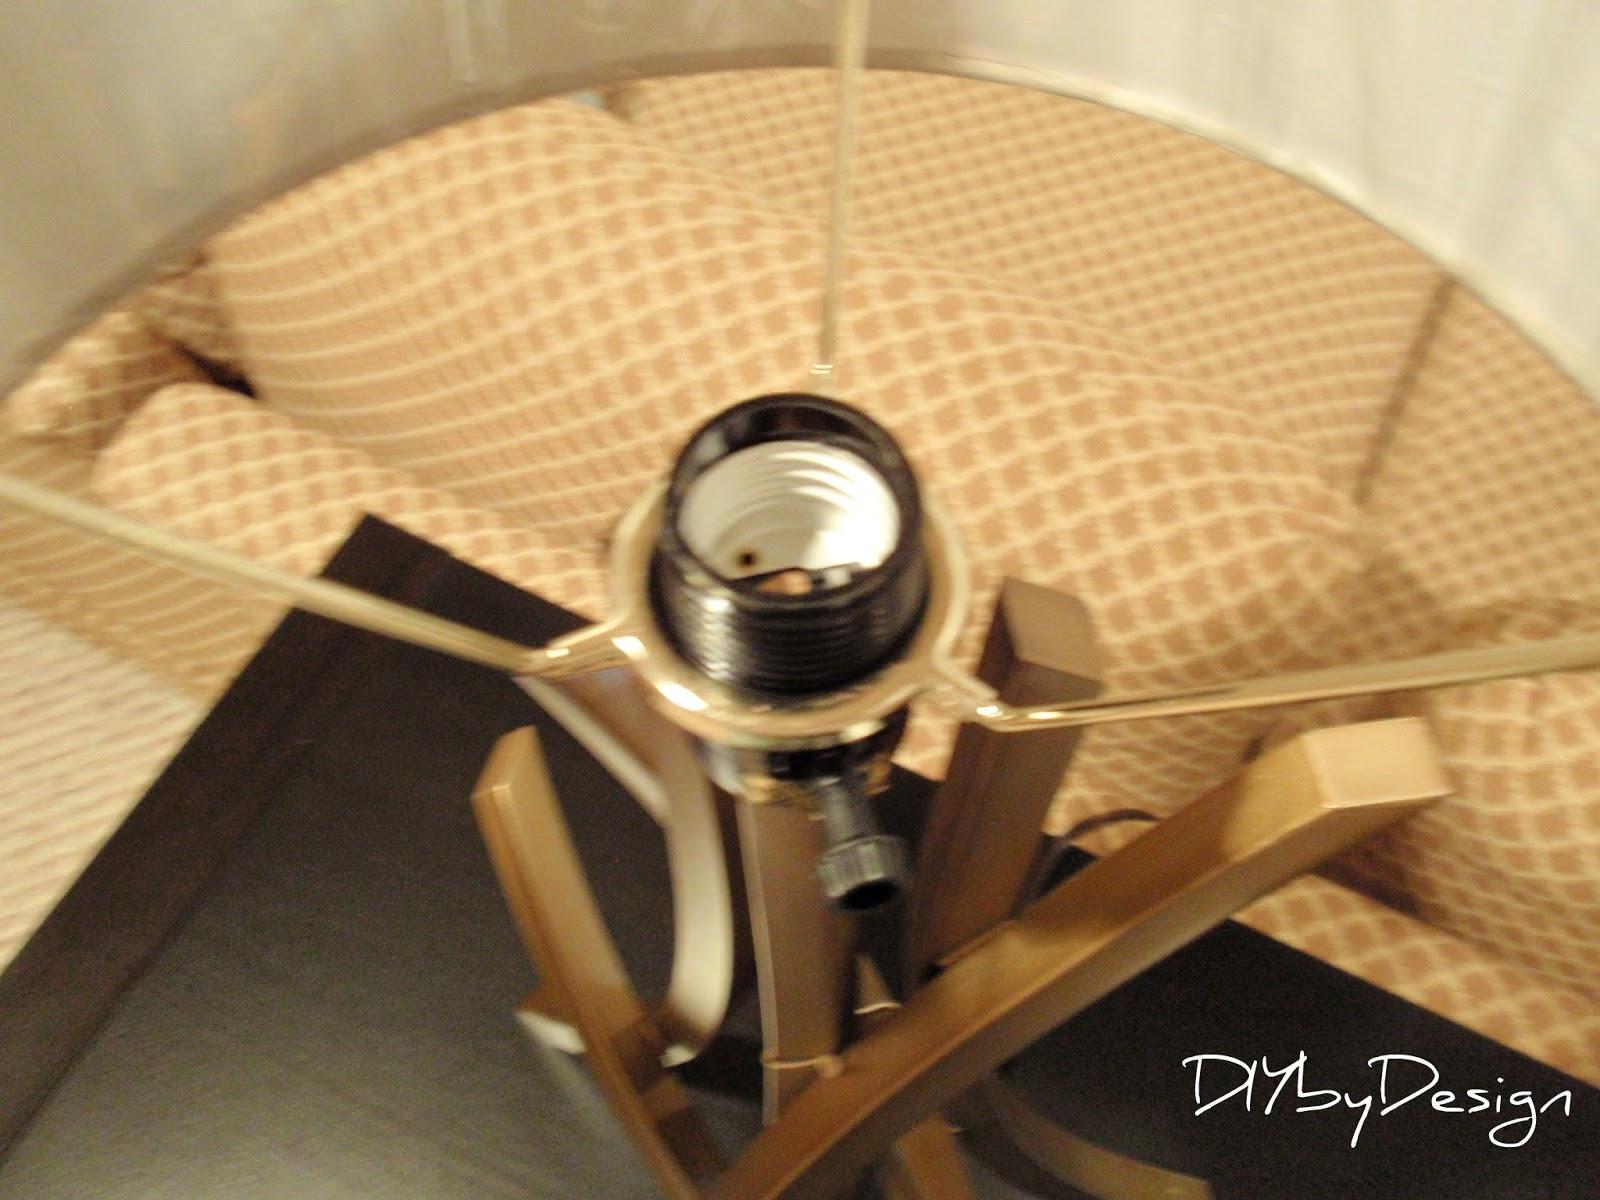 DIY by Design: Nate Berkus Branch Lamps Dilemma